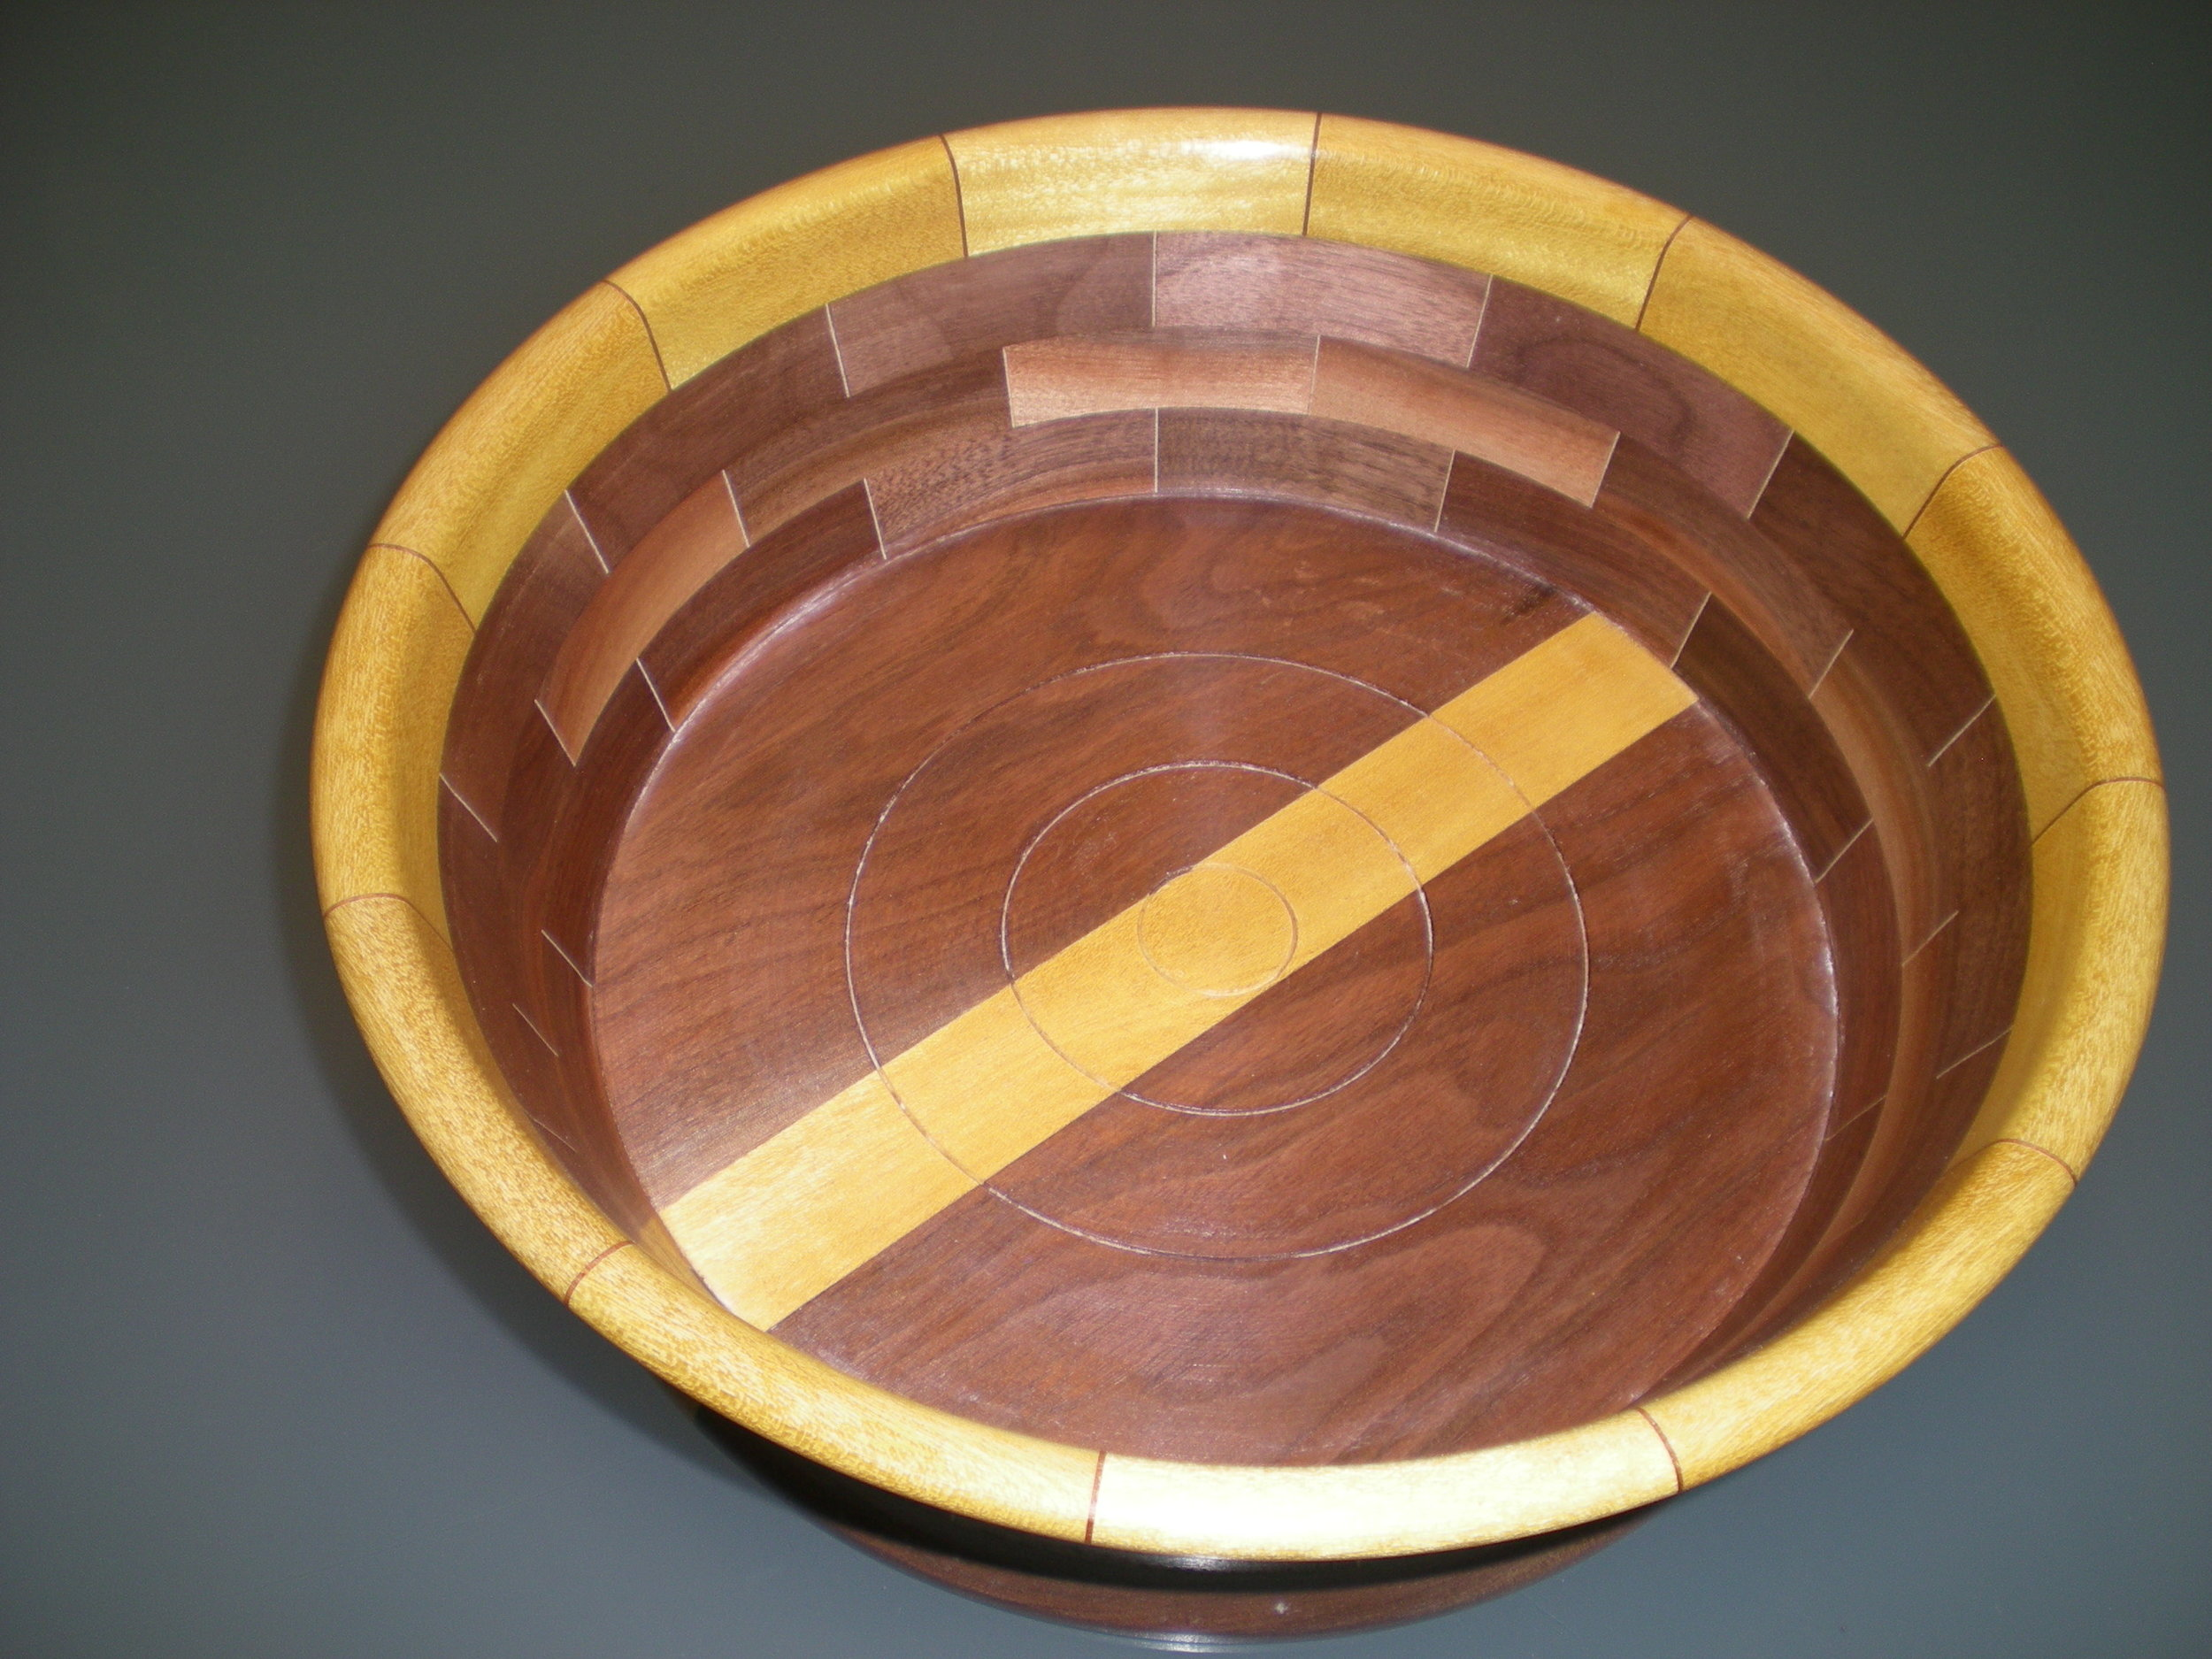 RJC Wood Creations - Bowls (38).JPG